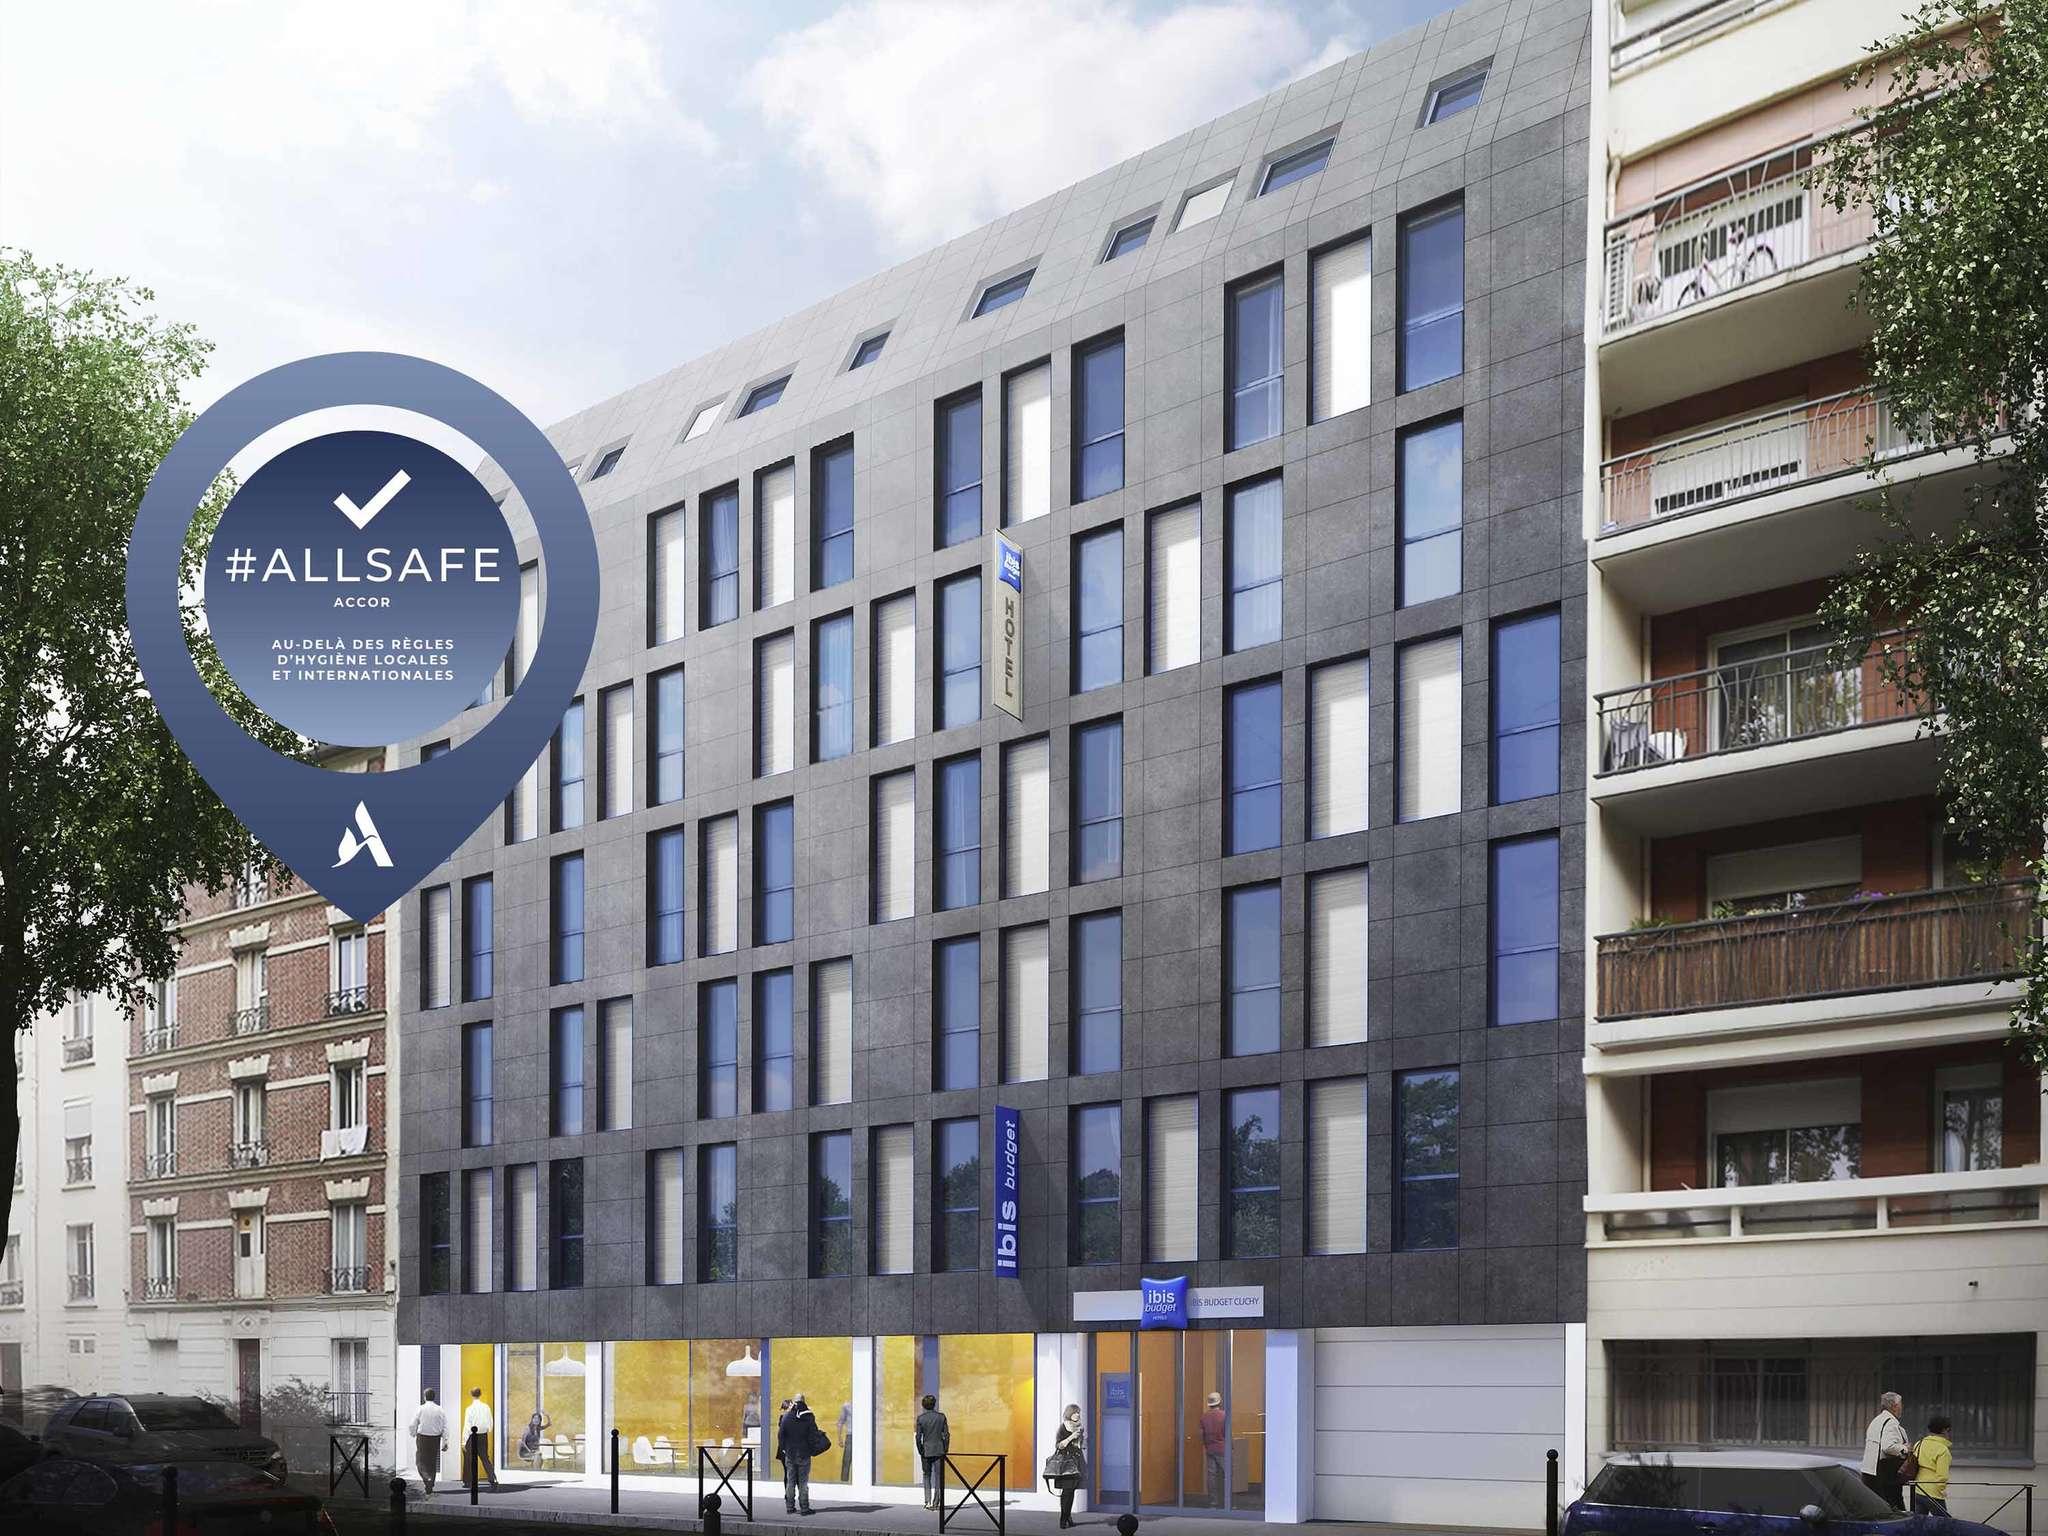 Hotel – ibis budget Paris Clichy Mairie (apertura aprile 2018)